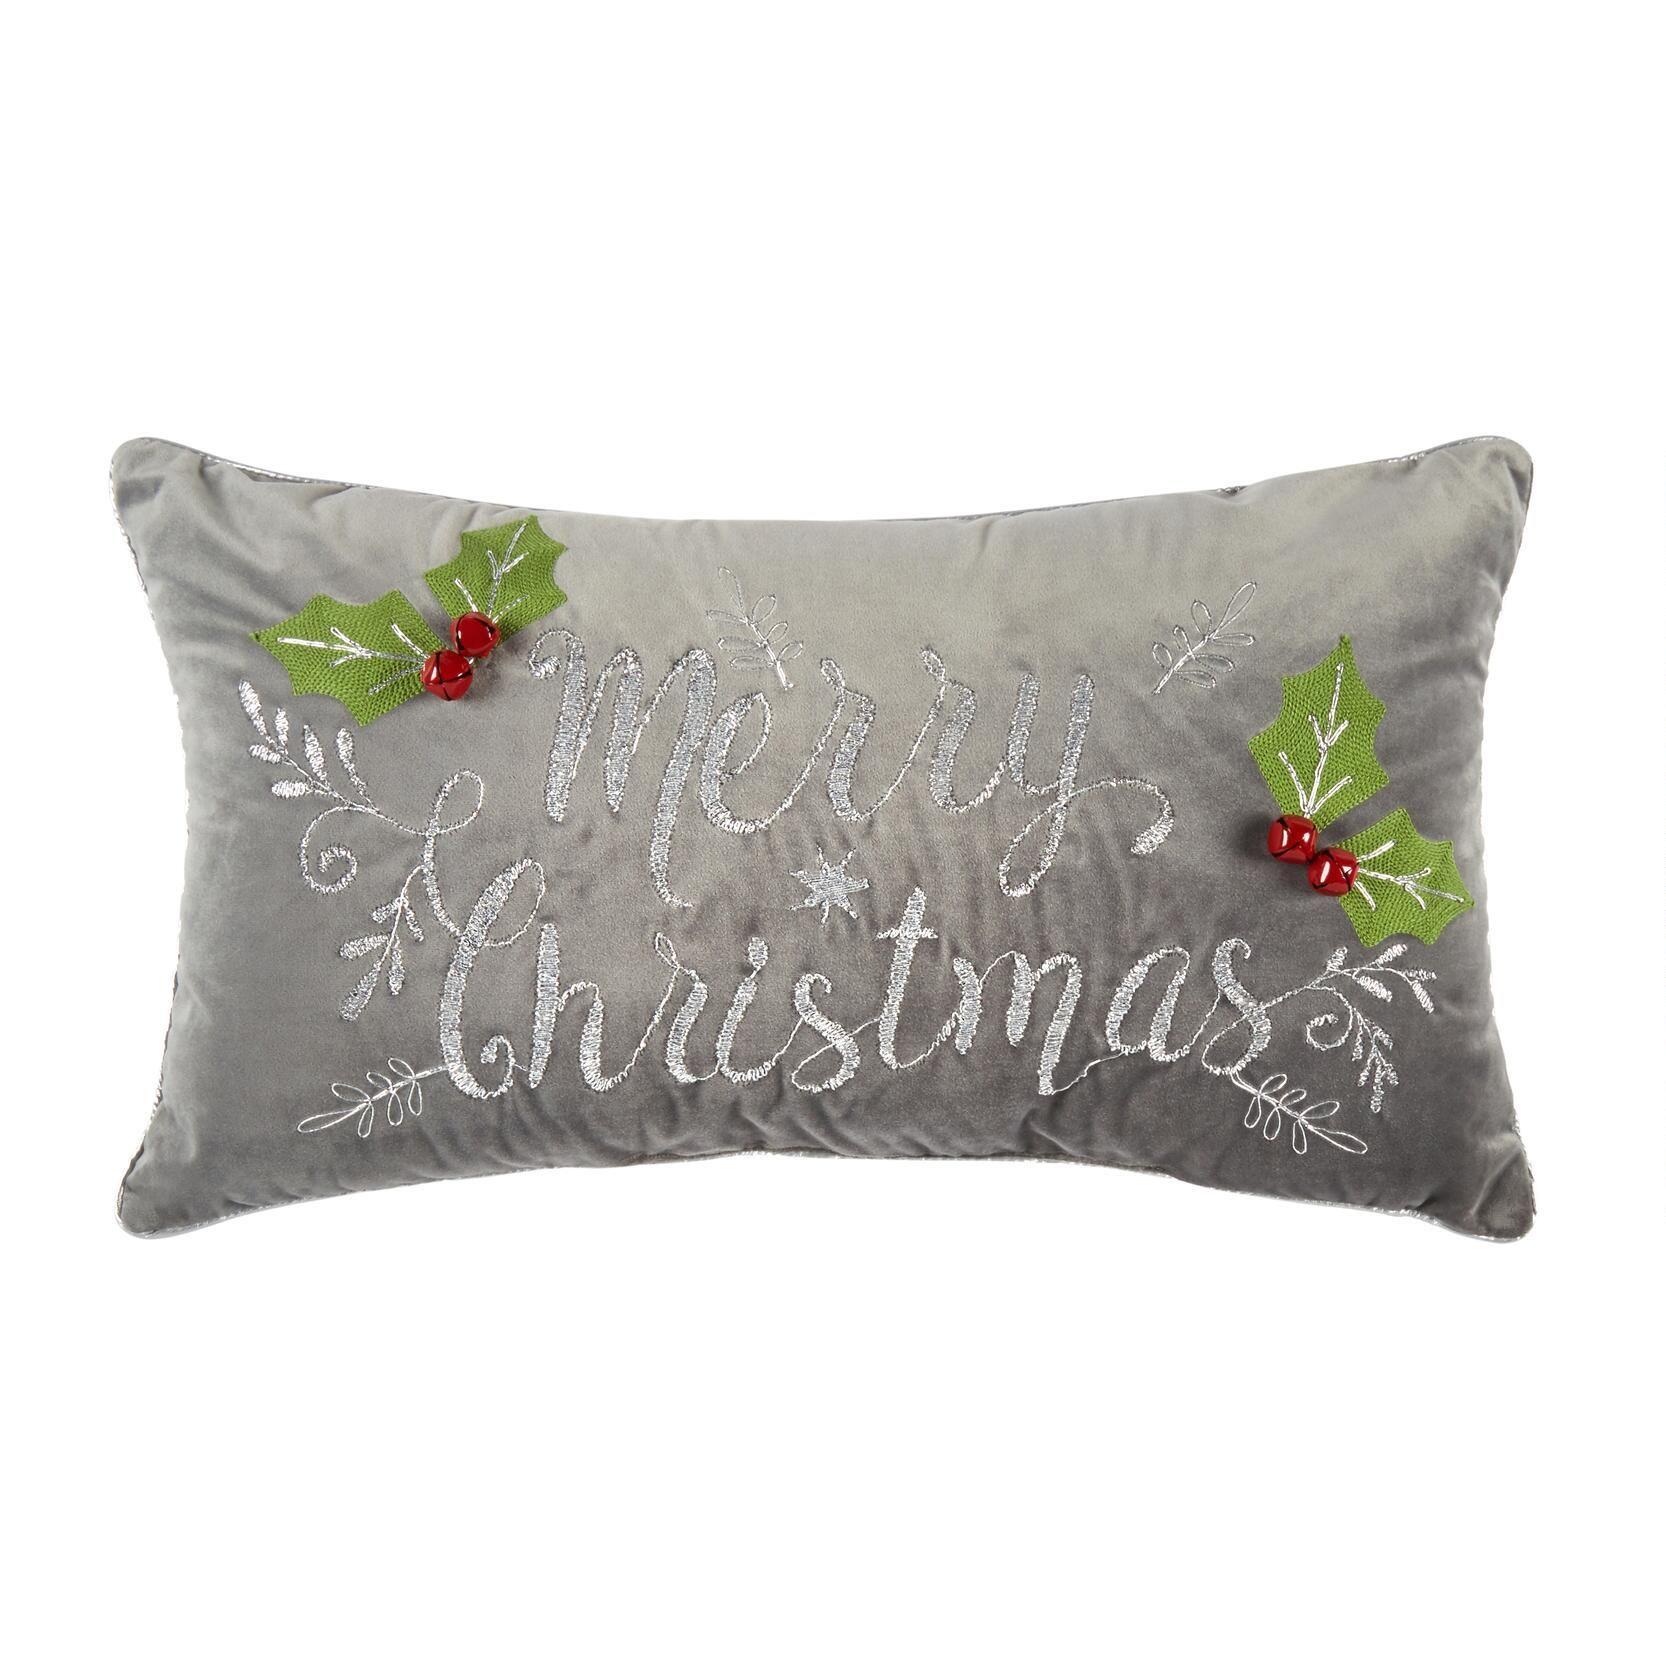 Merry Christmas Gray Oblong Throw Pillow Christmas Merry Throw Oblong Throw Pillow Throw Pillows Throw Pillows Christmas